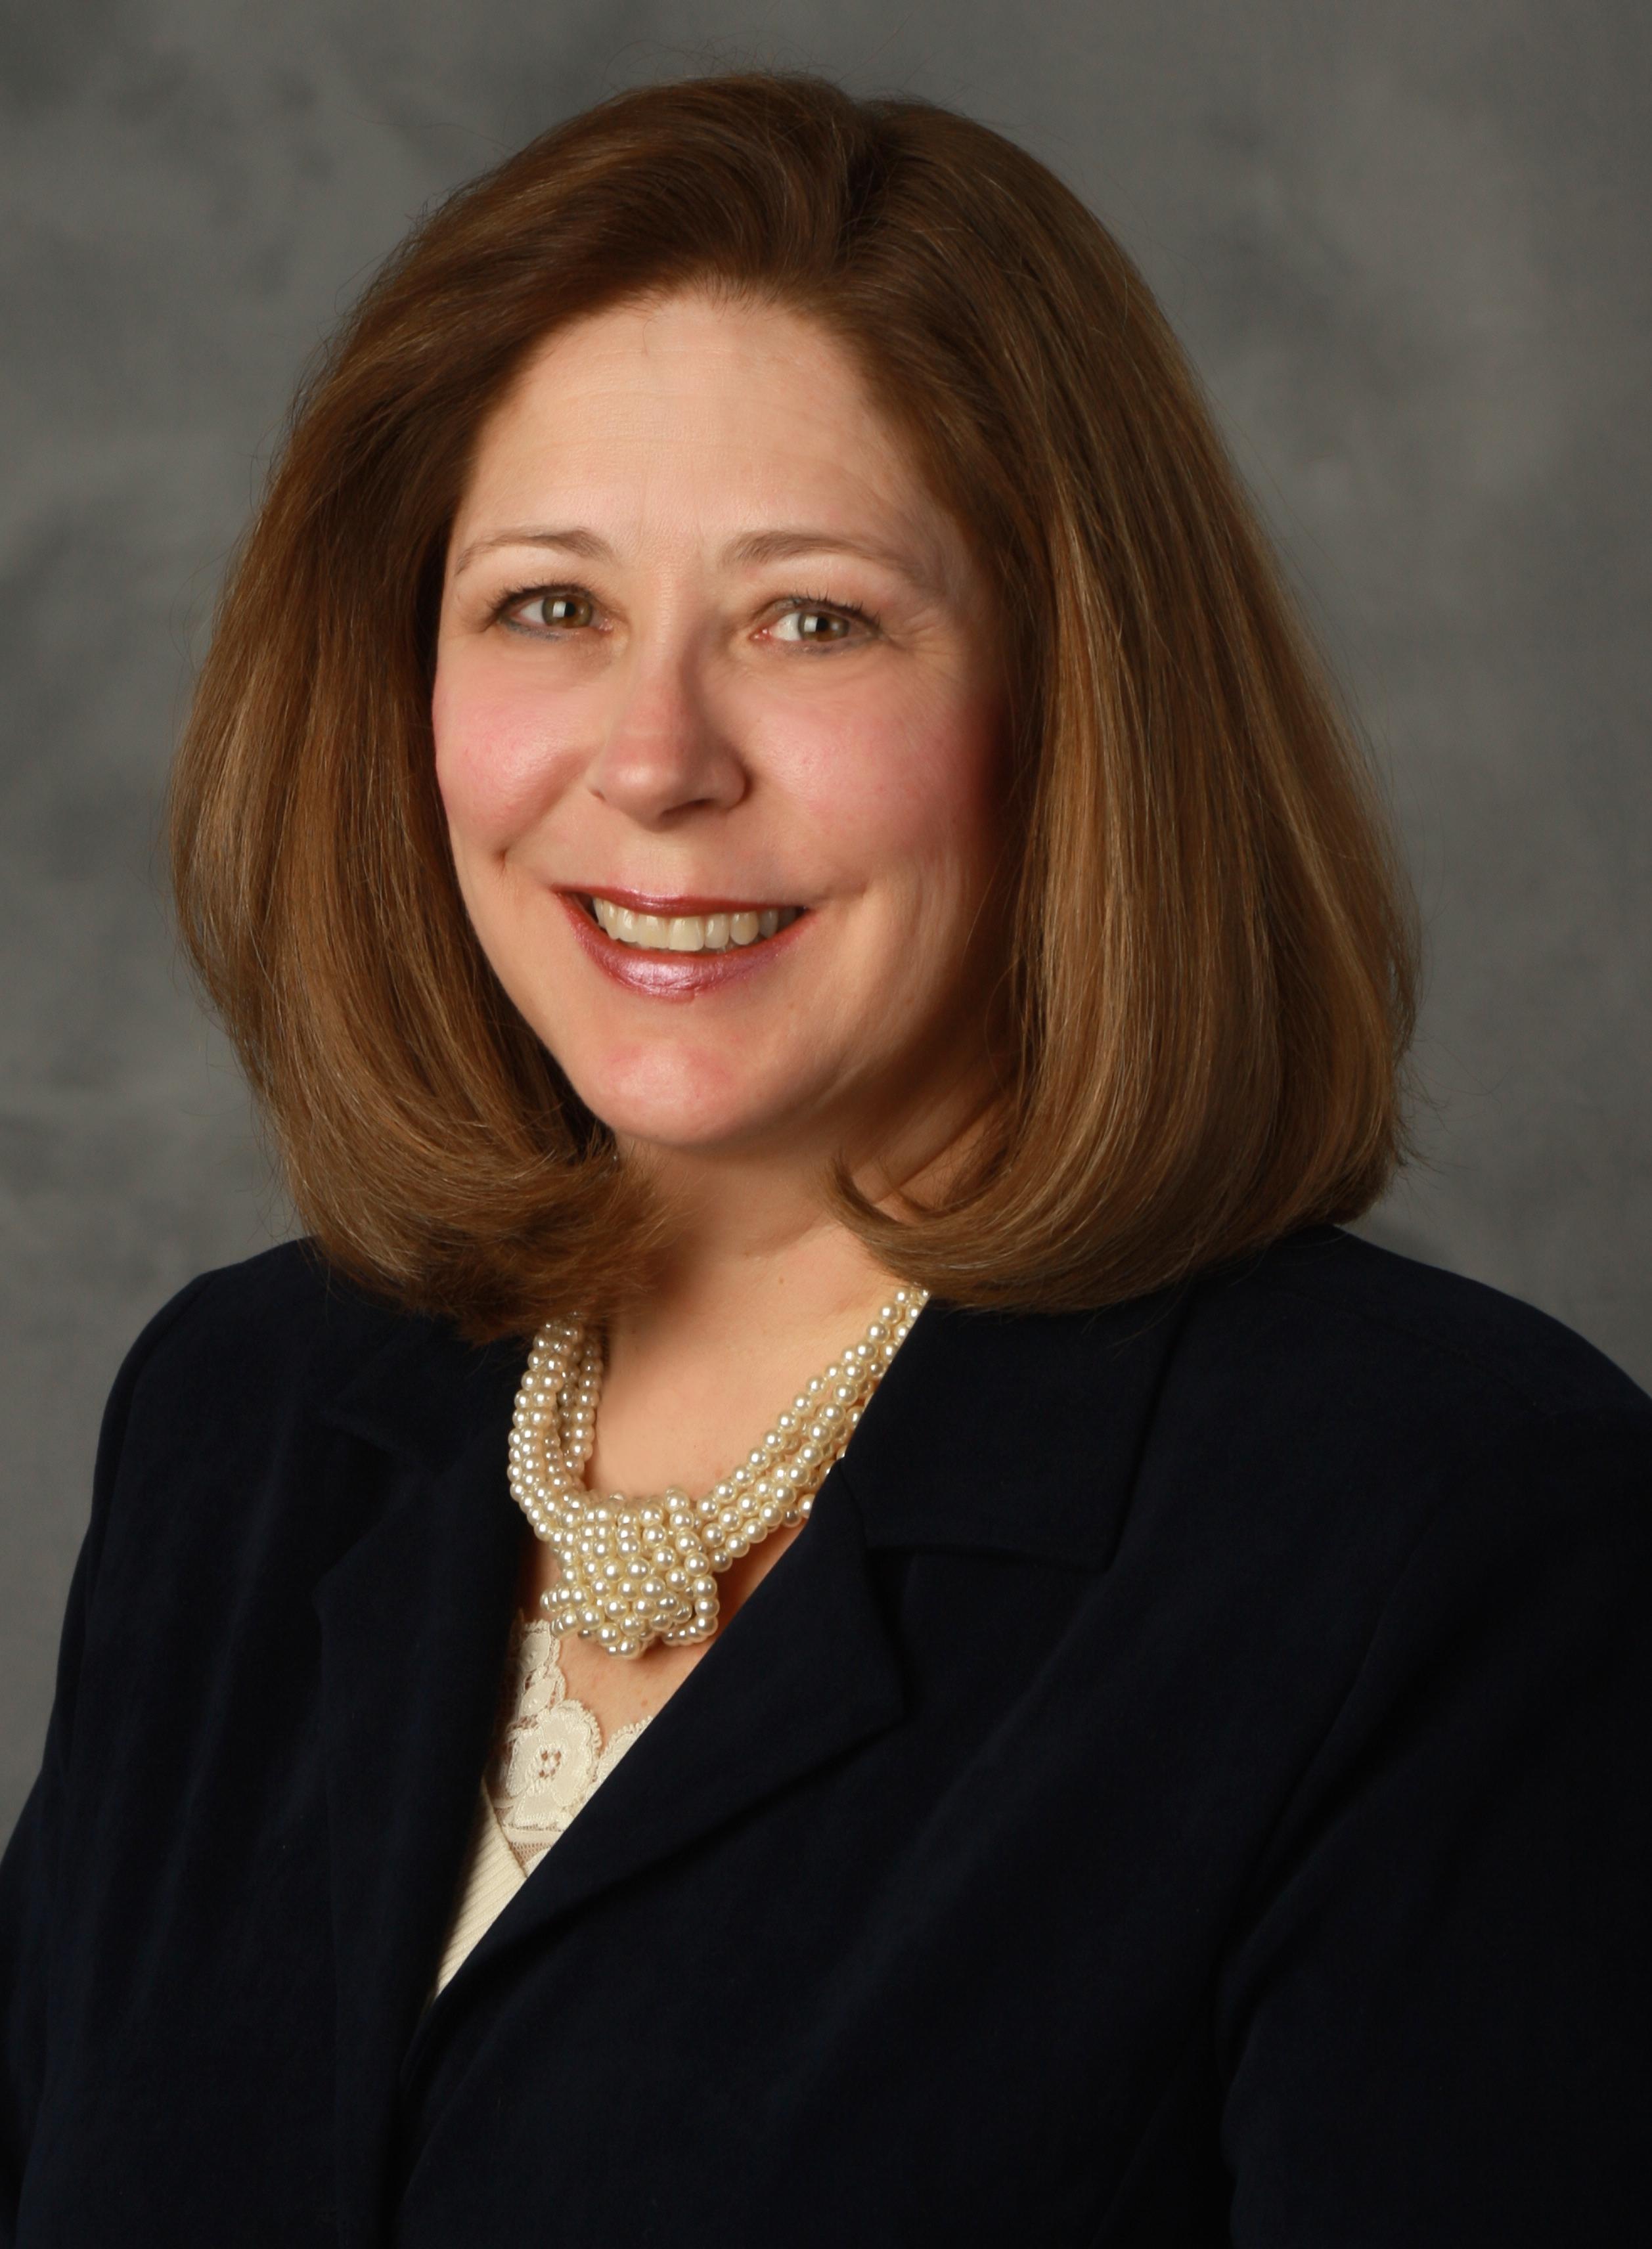 Jennifer Caterini